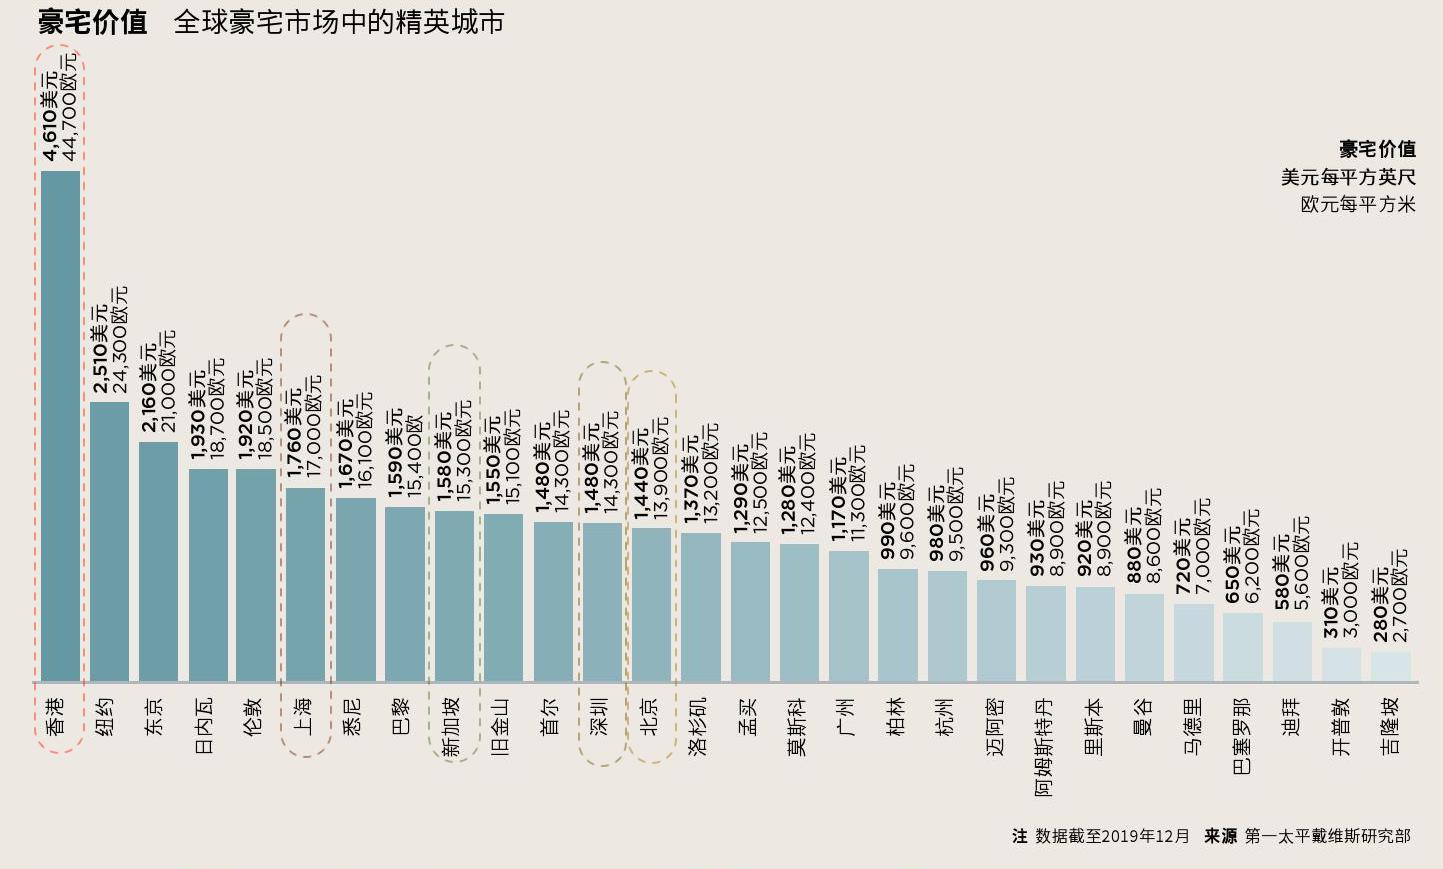 luxury residential property 豪宅价格指数-世界城市排名 2019年